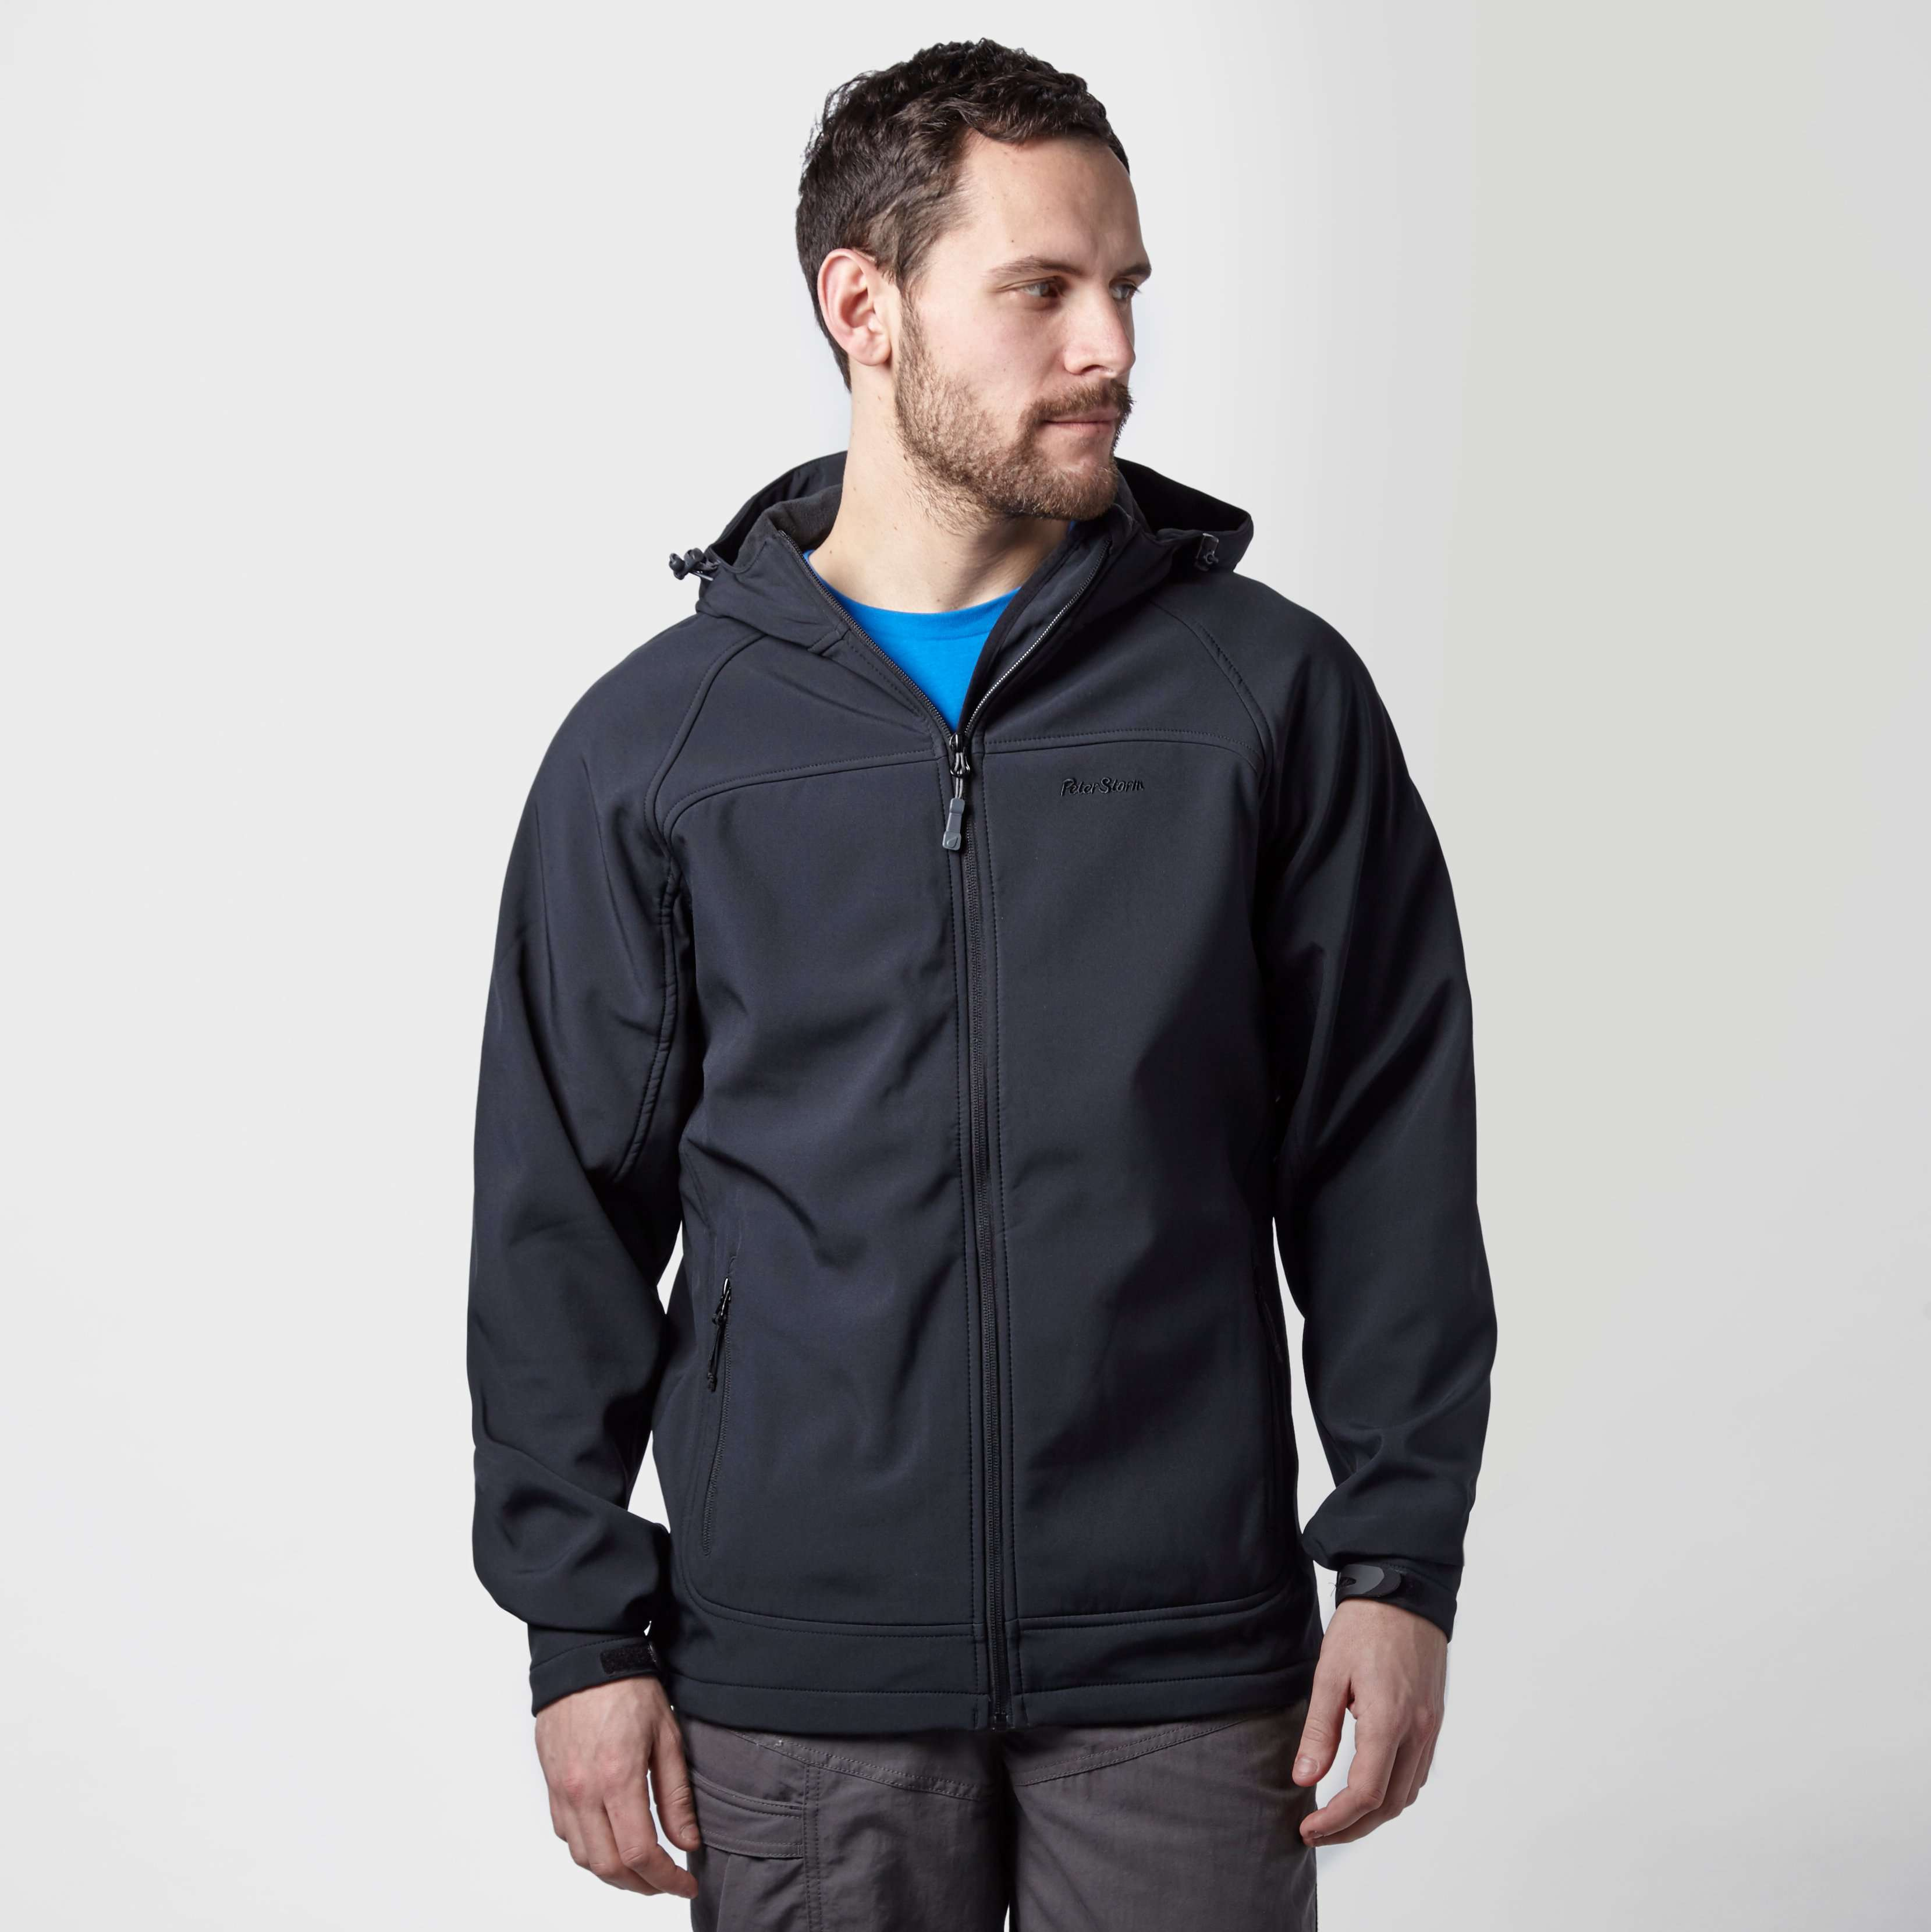 PETER STORM Men's Hooded Softshell Jacket